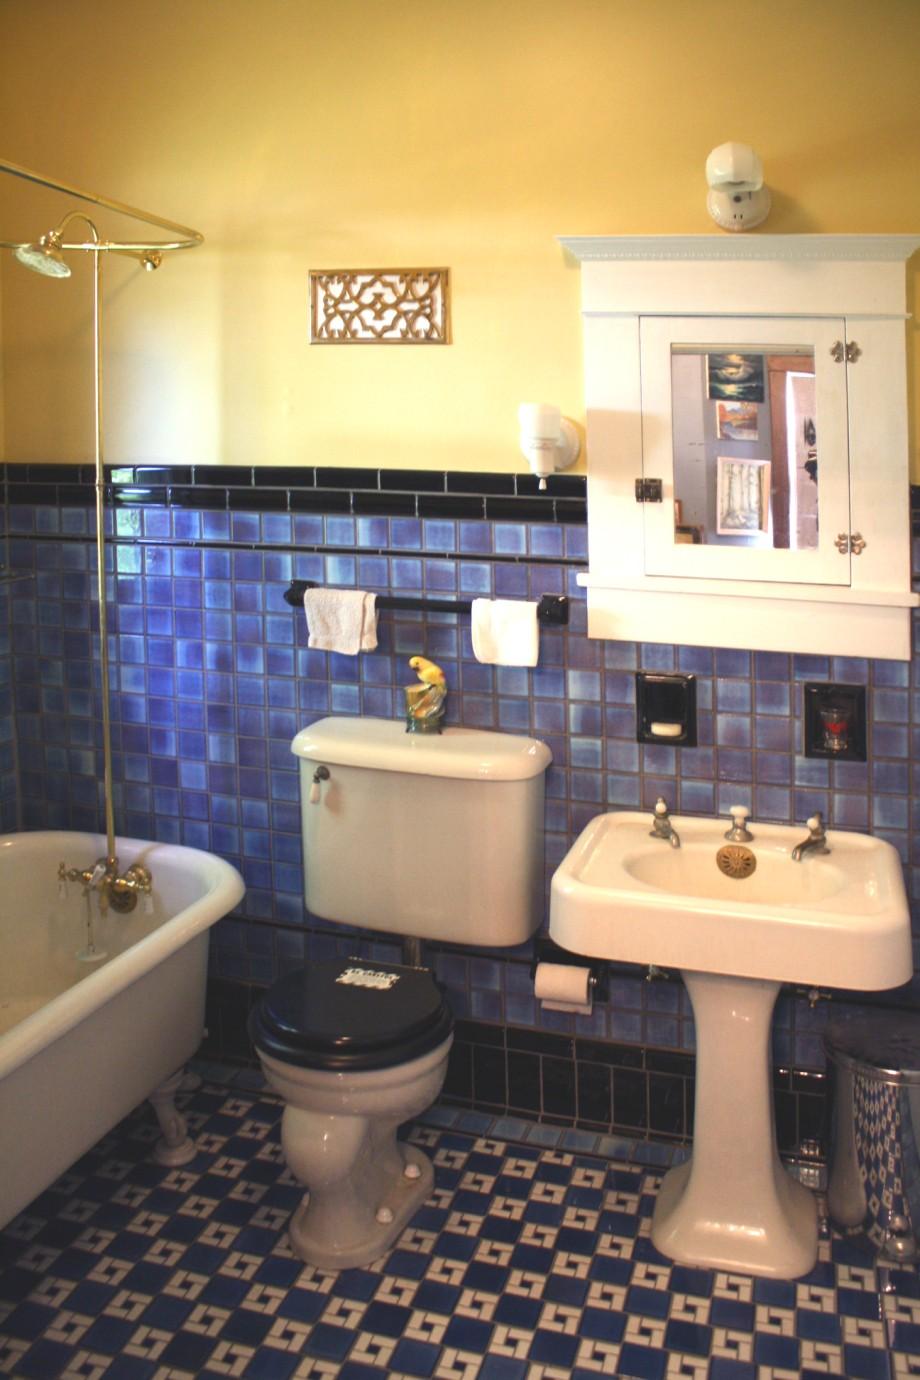 Arts and crafts bathroom tile - New American Universal 20s Blue Black Tile Bathroom